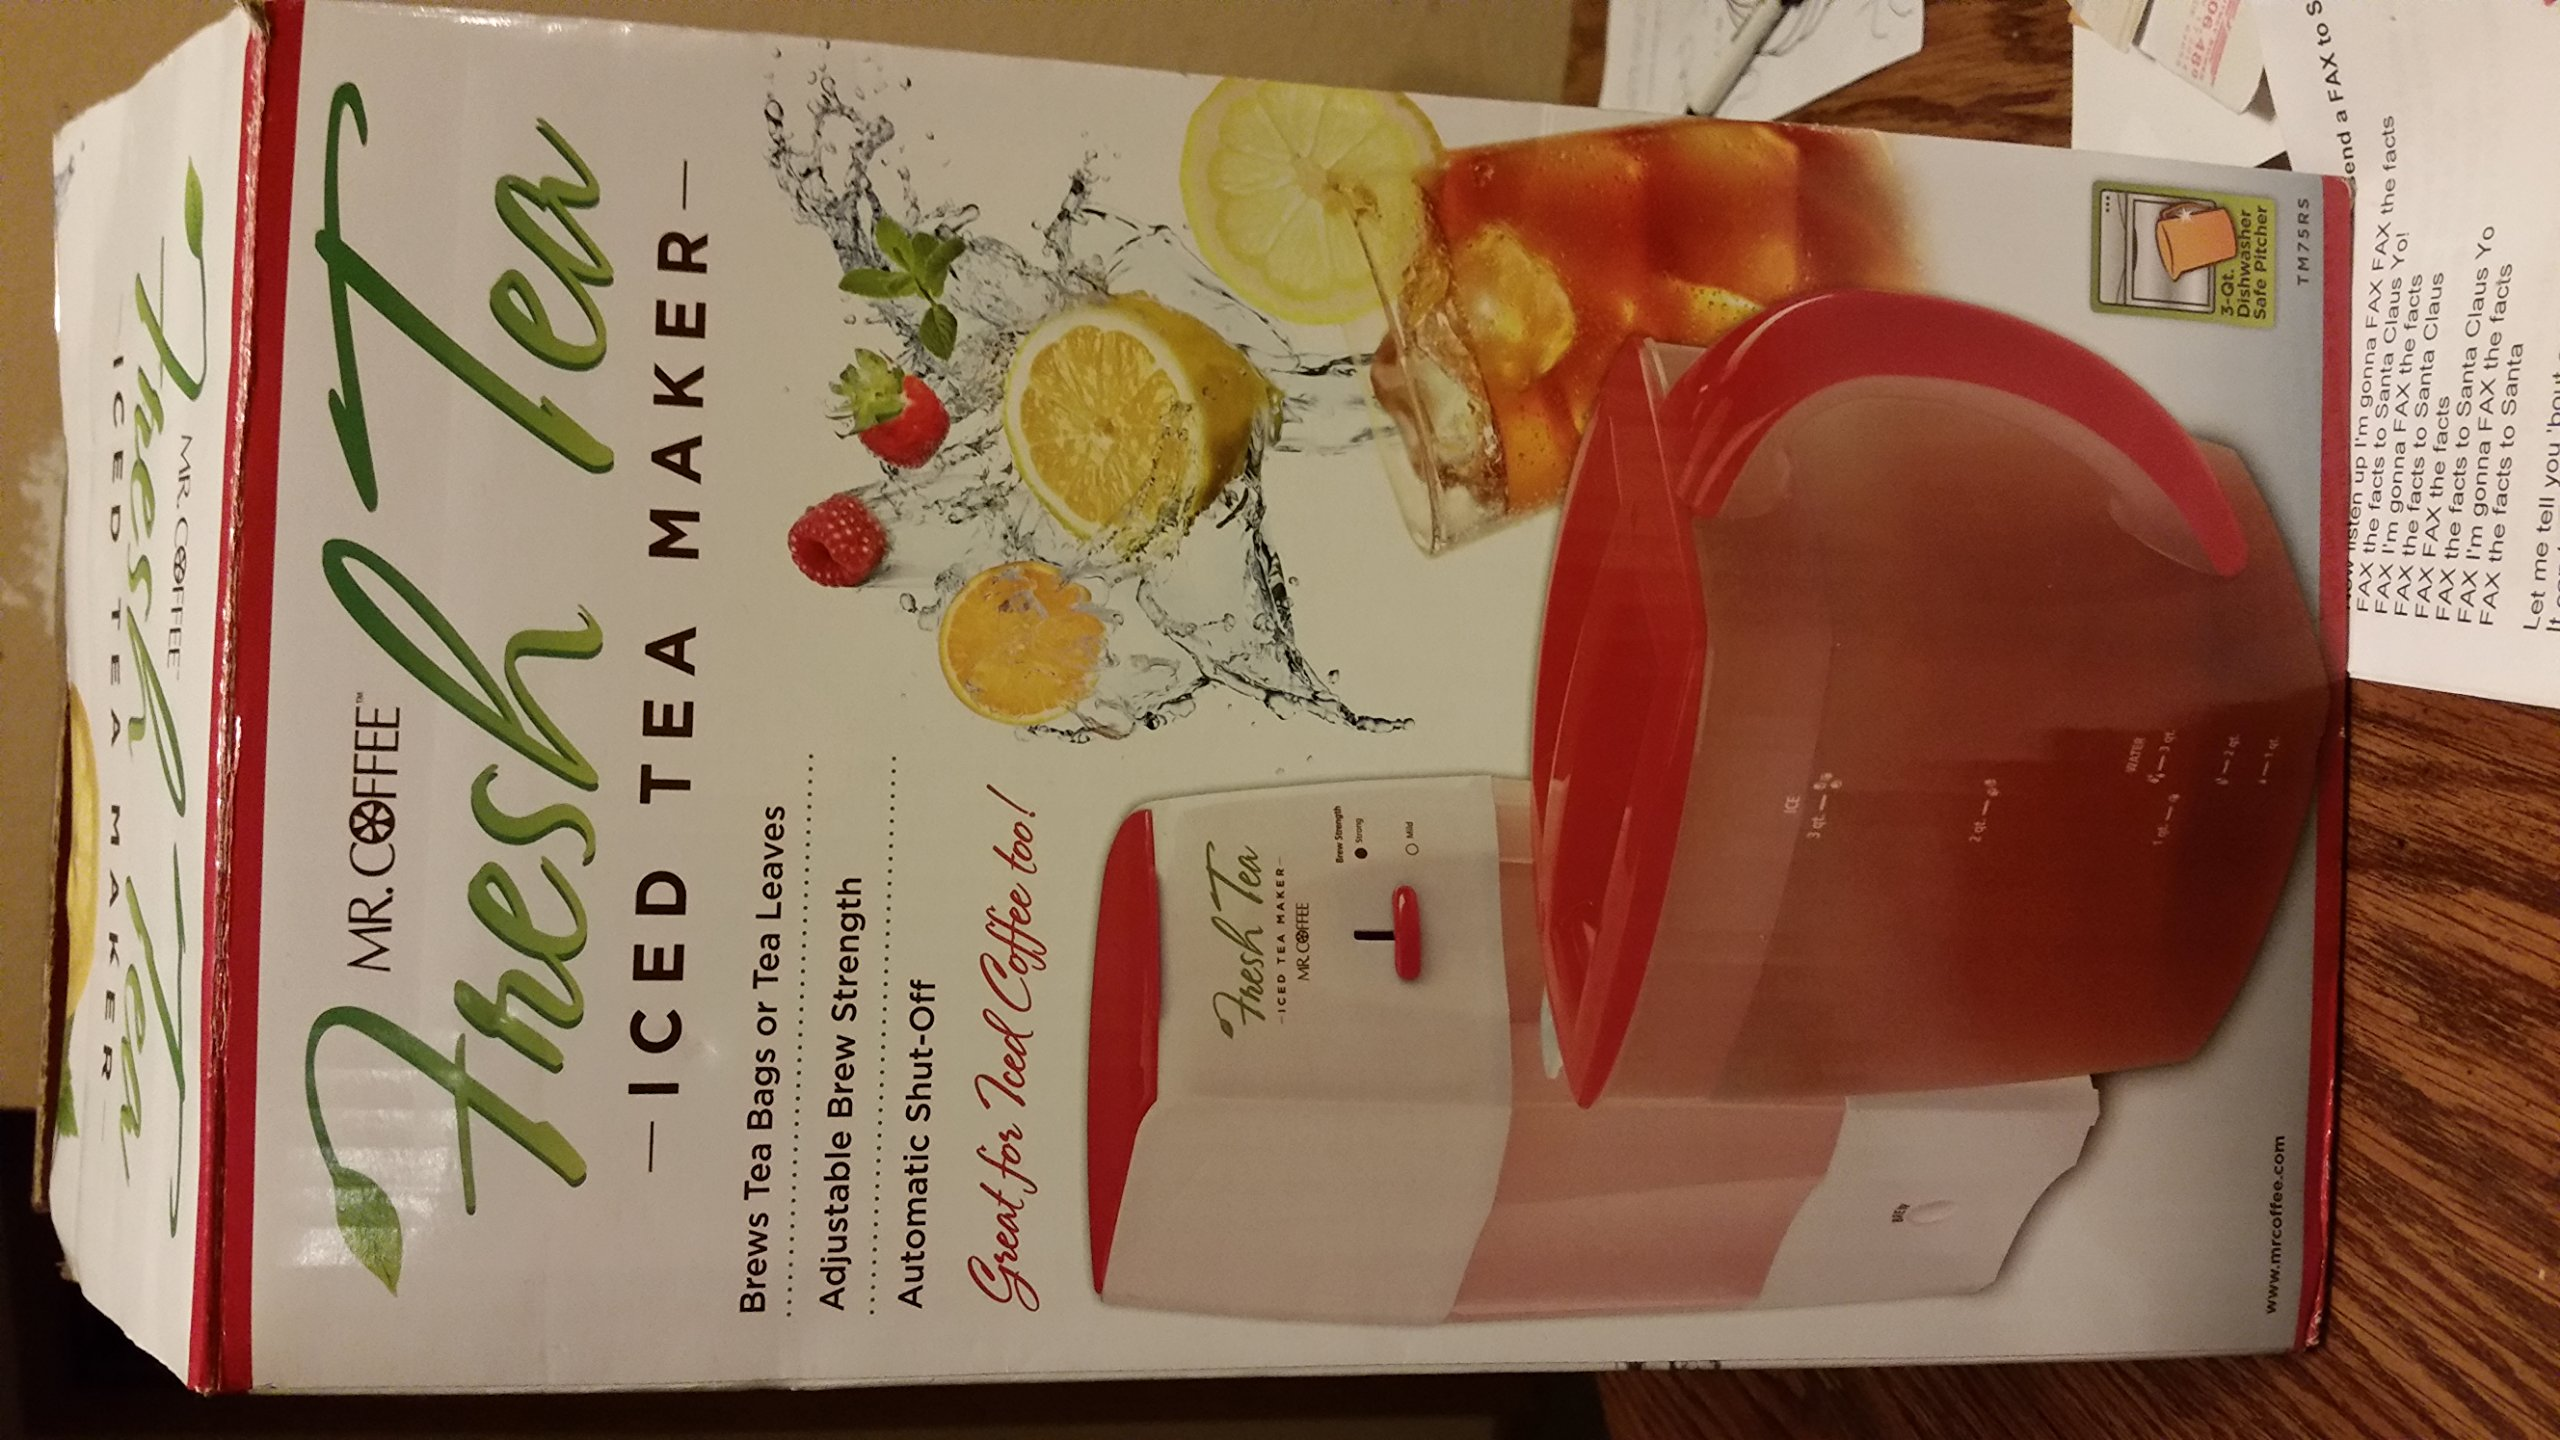 Mr. Coffee Fresh Tea Iced Tea Maker by Mr. Coffee